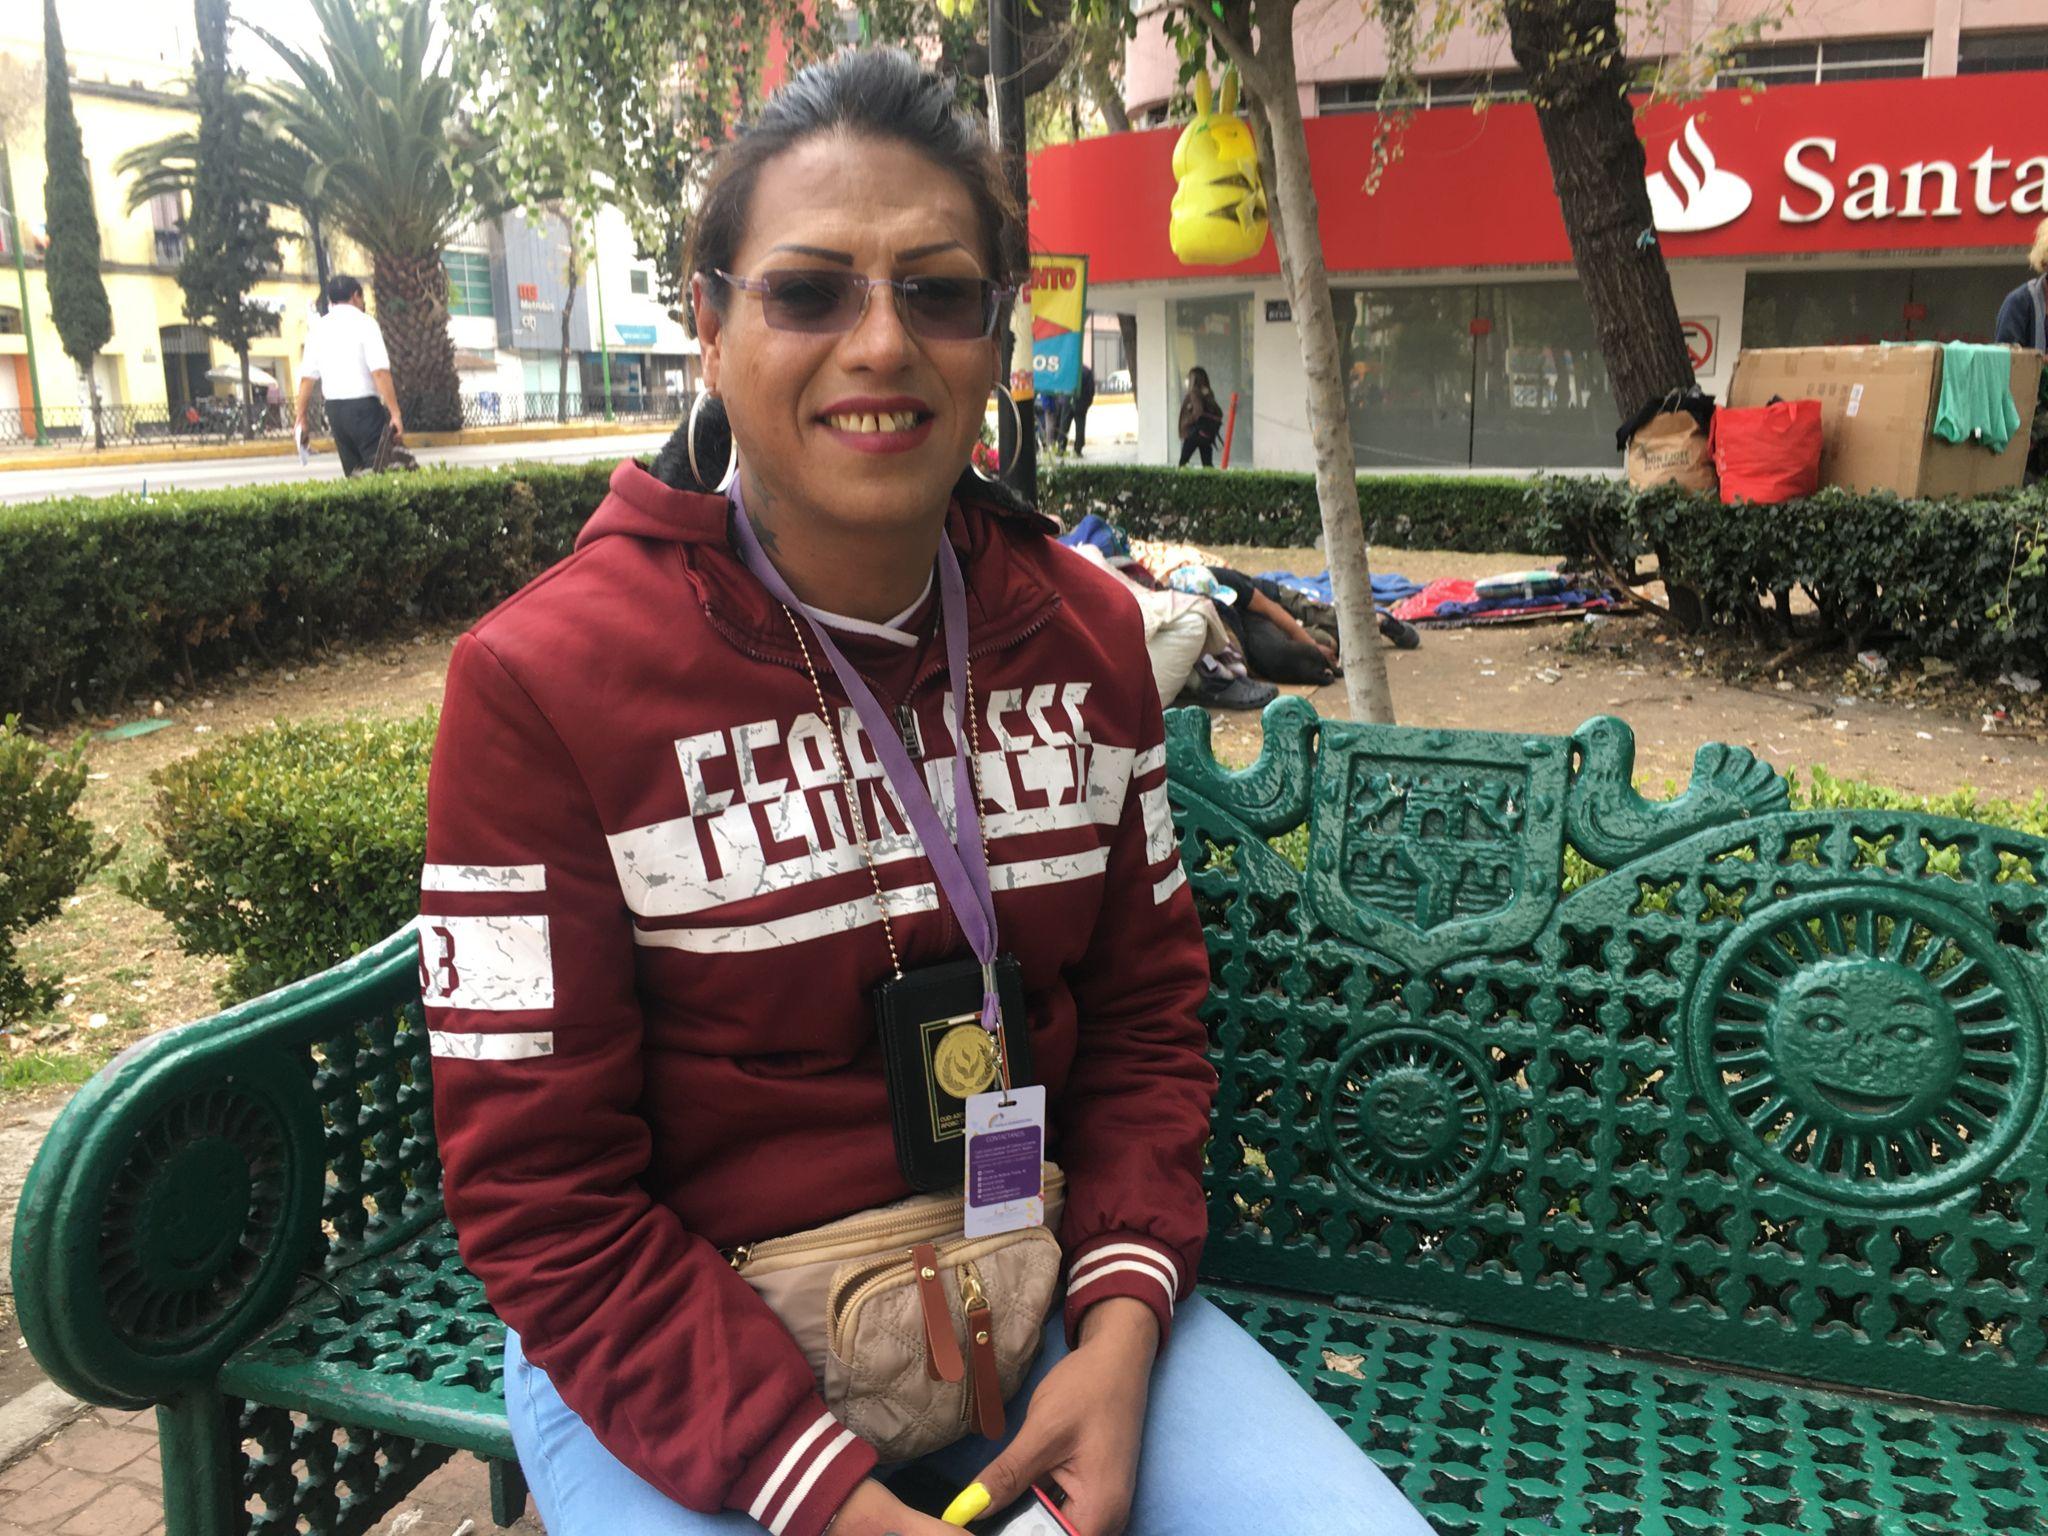 Kenya Cuevas is one of Latin America's best-known transgender activists